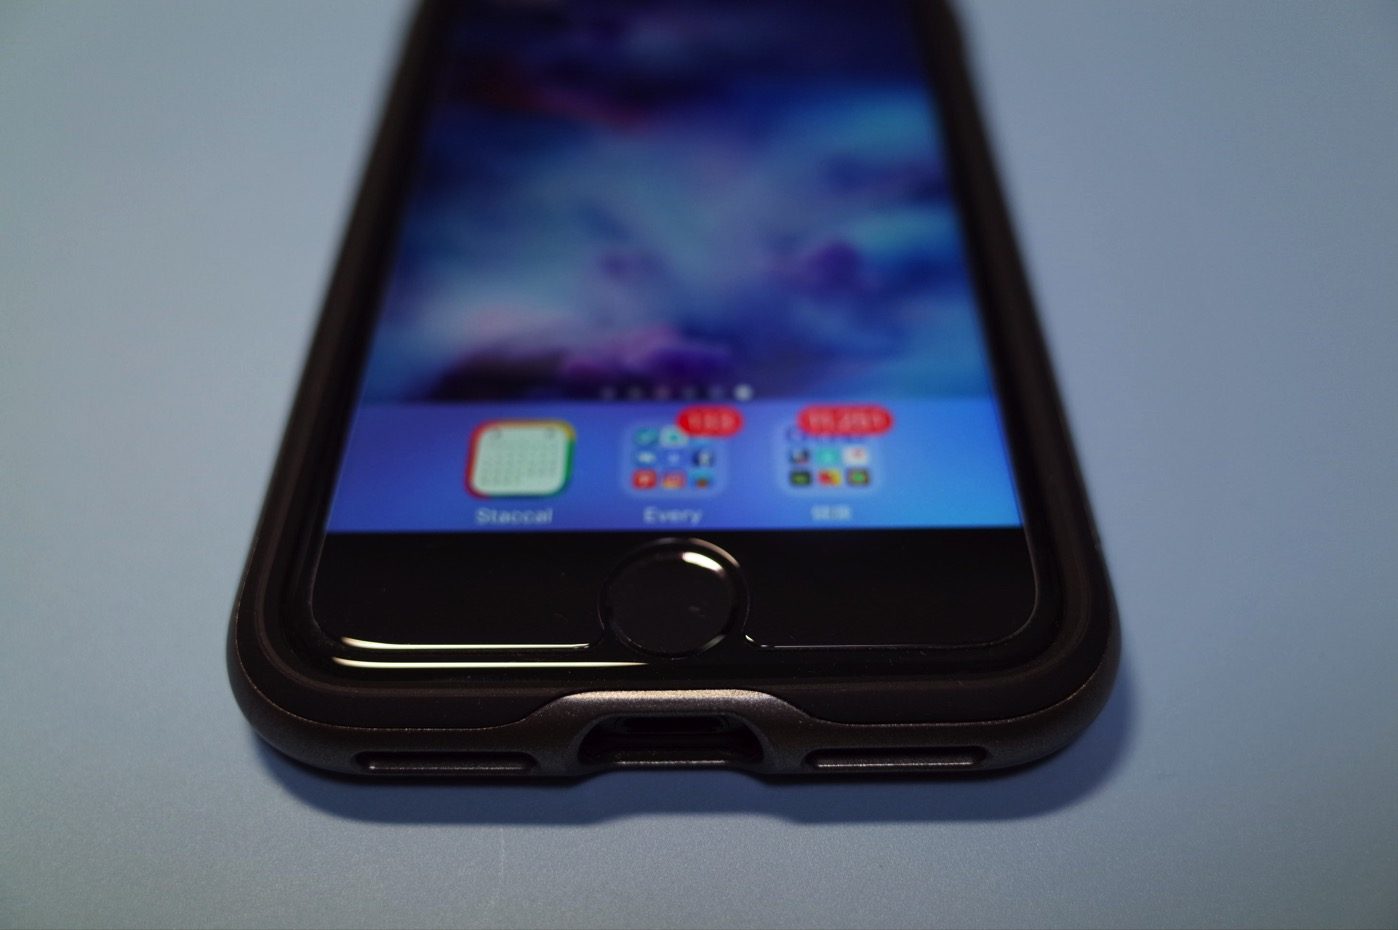 iPhoneケース「ネオ・ハイブリッド米軍MIL規格取得 二重構造バンパー」-10